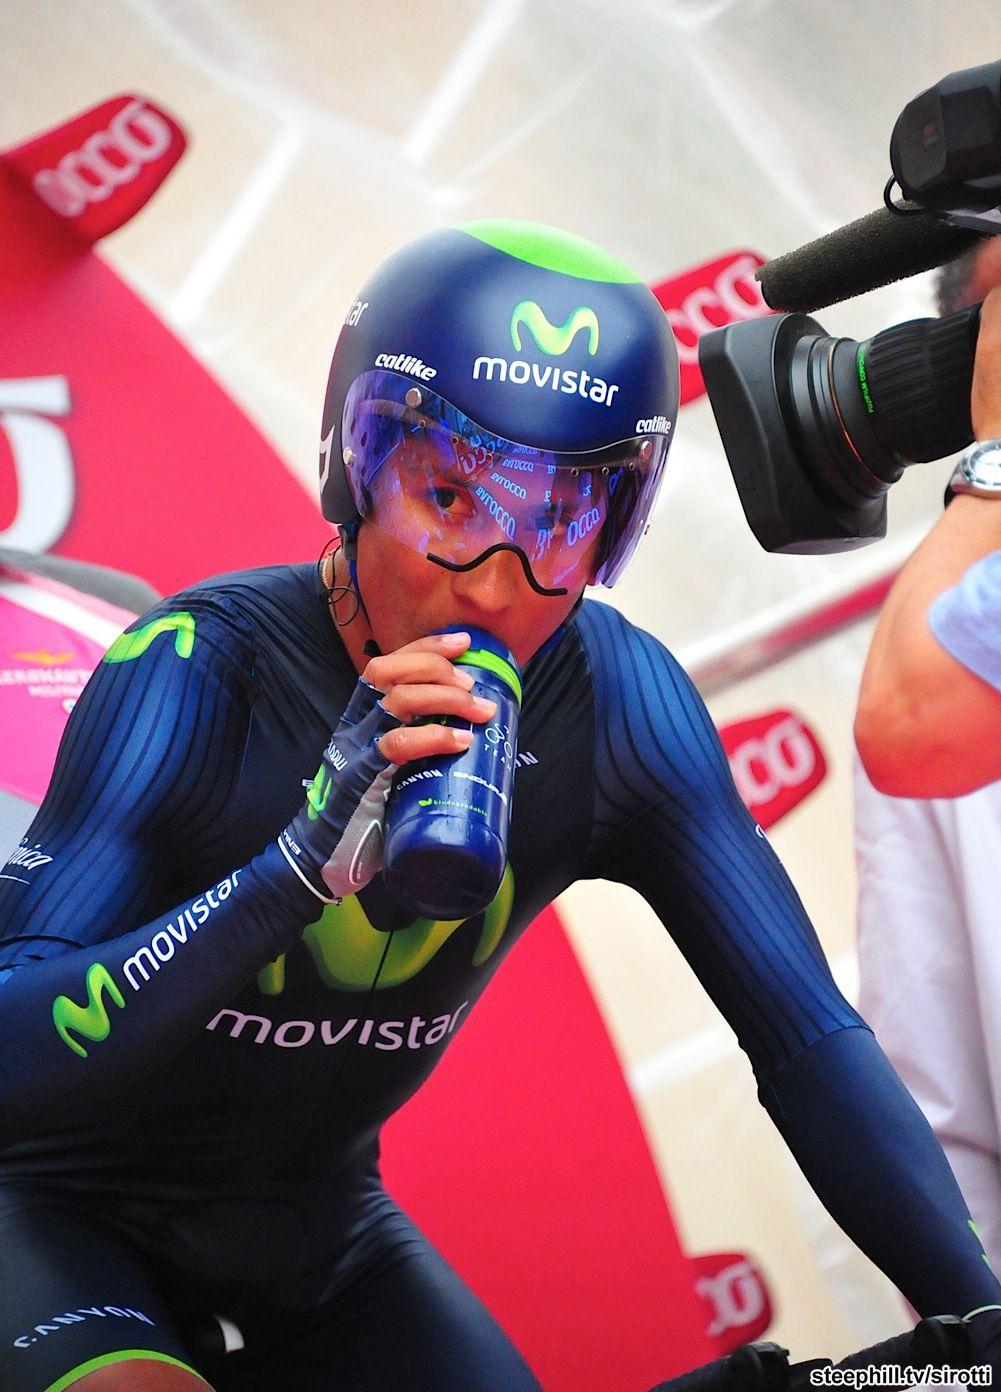 Giro 2014 12 41 9 Km Itt Barbaresco Barolo Nairo Quintana Colombia Movistar In Barbaresco Nairo Ciclista Ciclismo